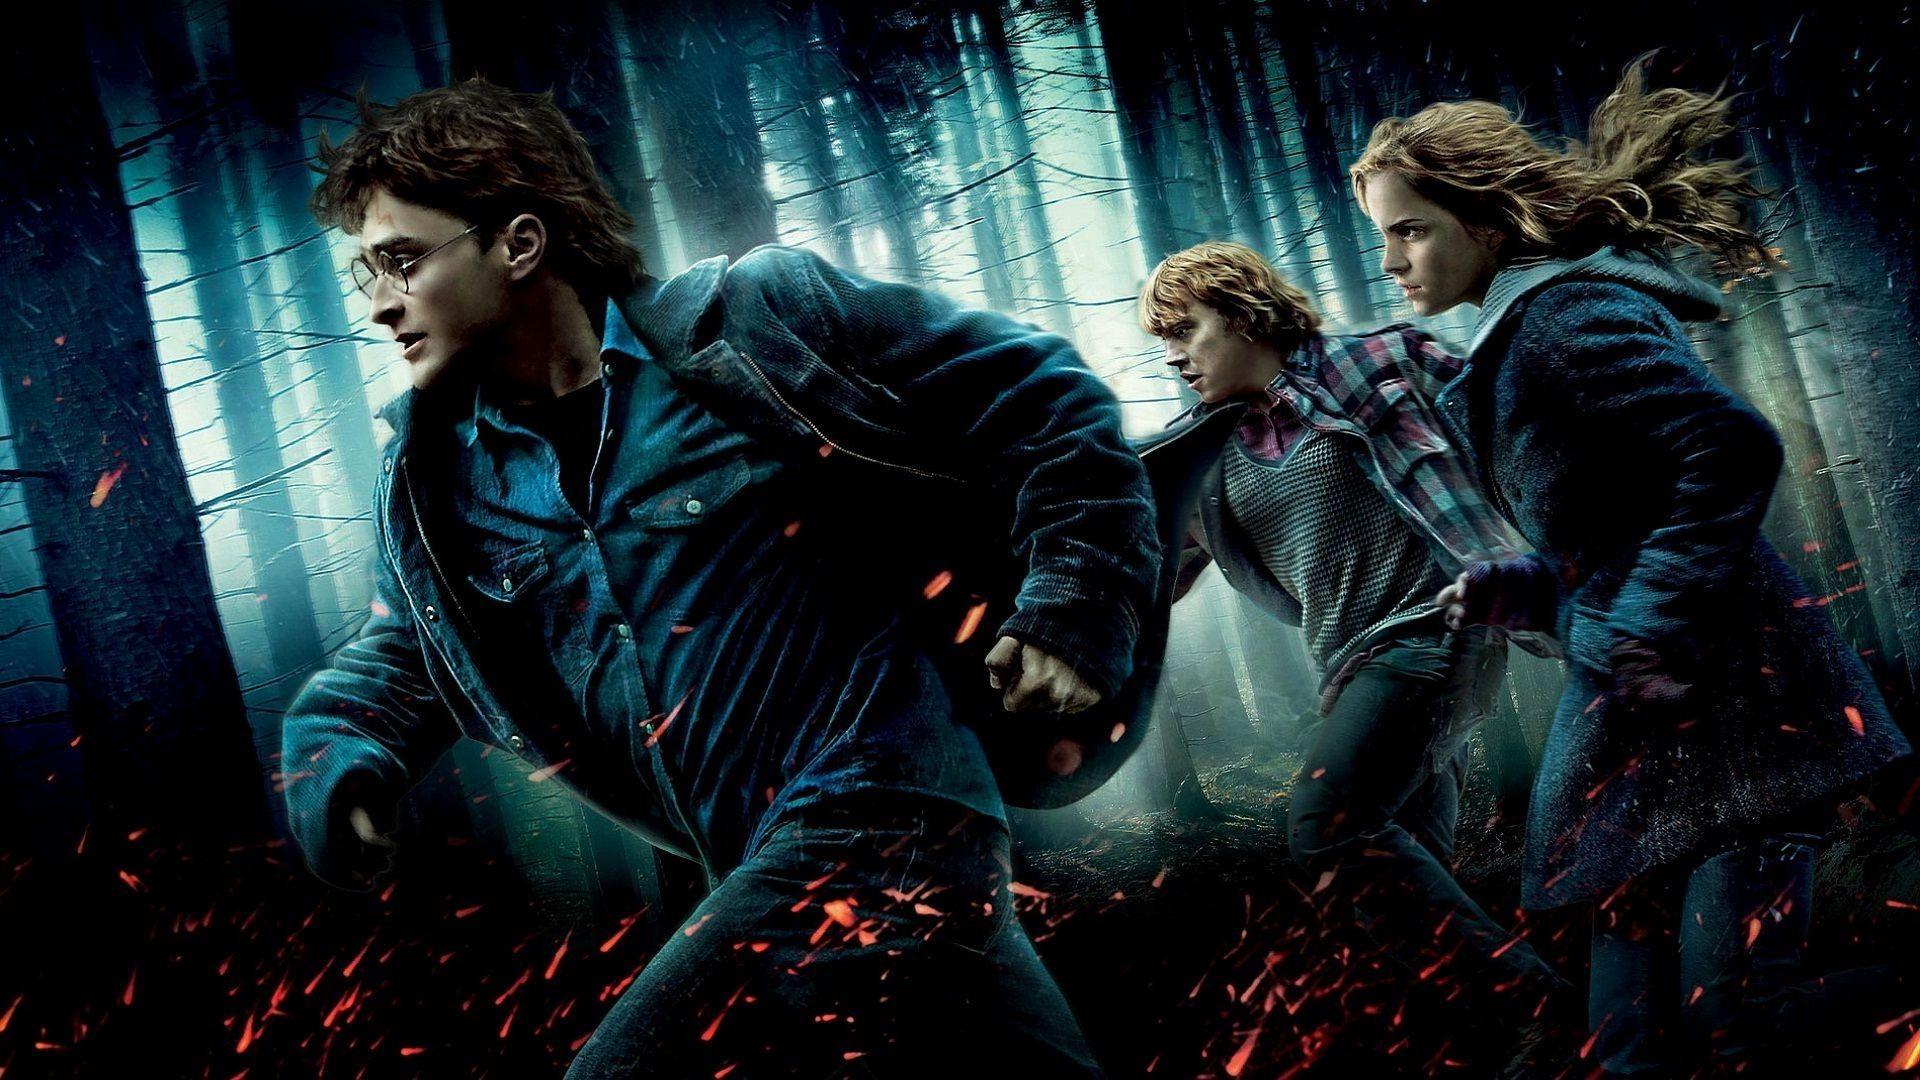 Amazing Wallpaper Harry Potter Twitter - 656423-best-harry-potter-twitter-background-1920x1080-for-ipad-2  Graphic_678791.jpg